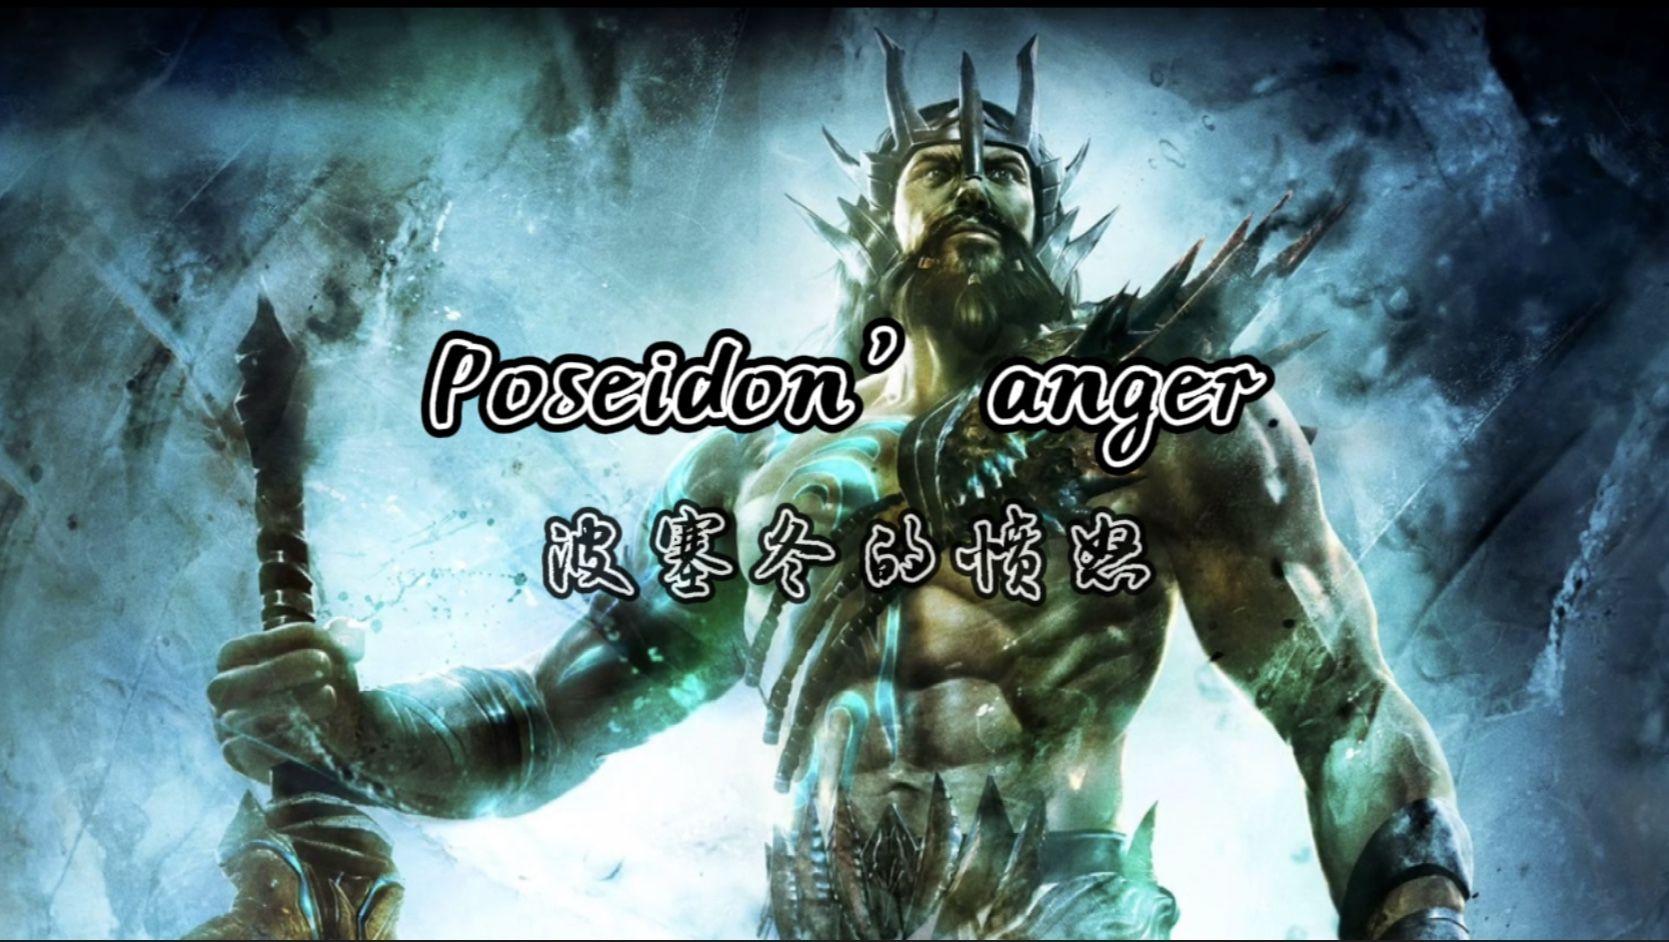 Poseidon' anger (波塞冬的愤怒)